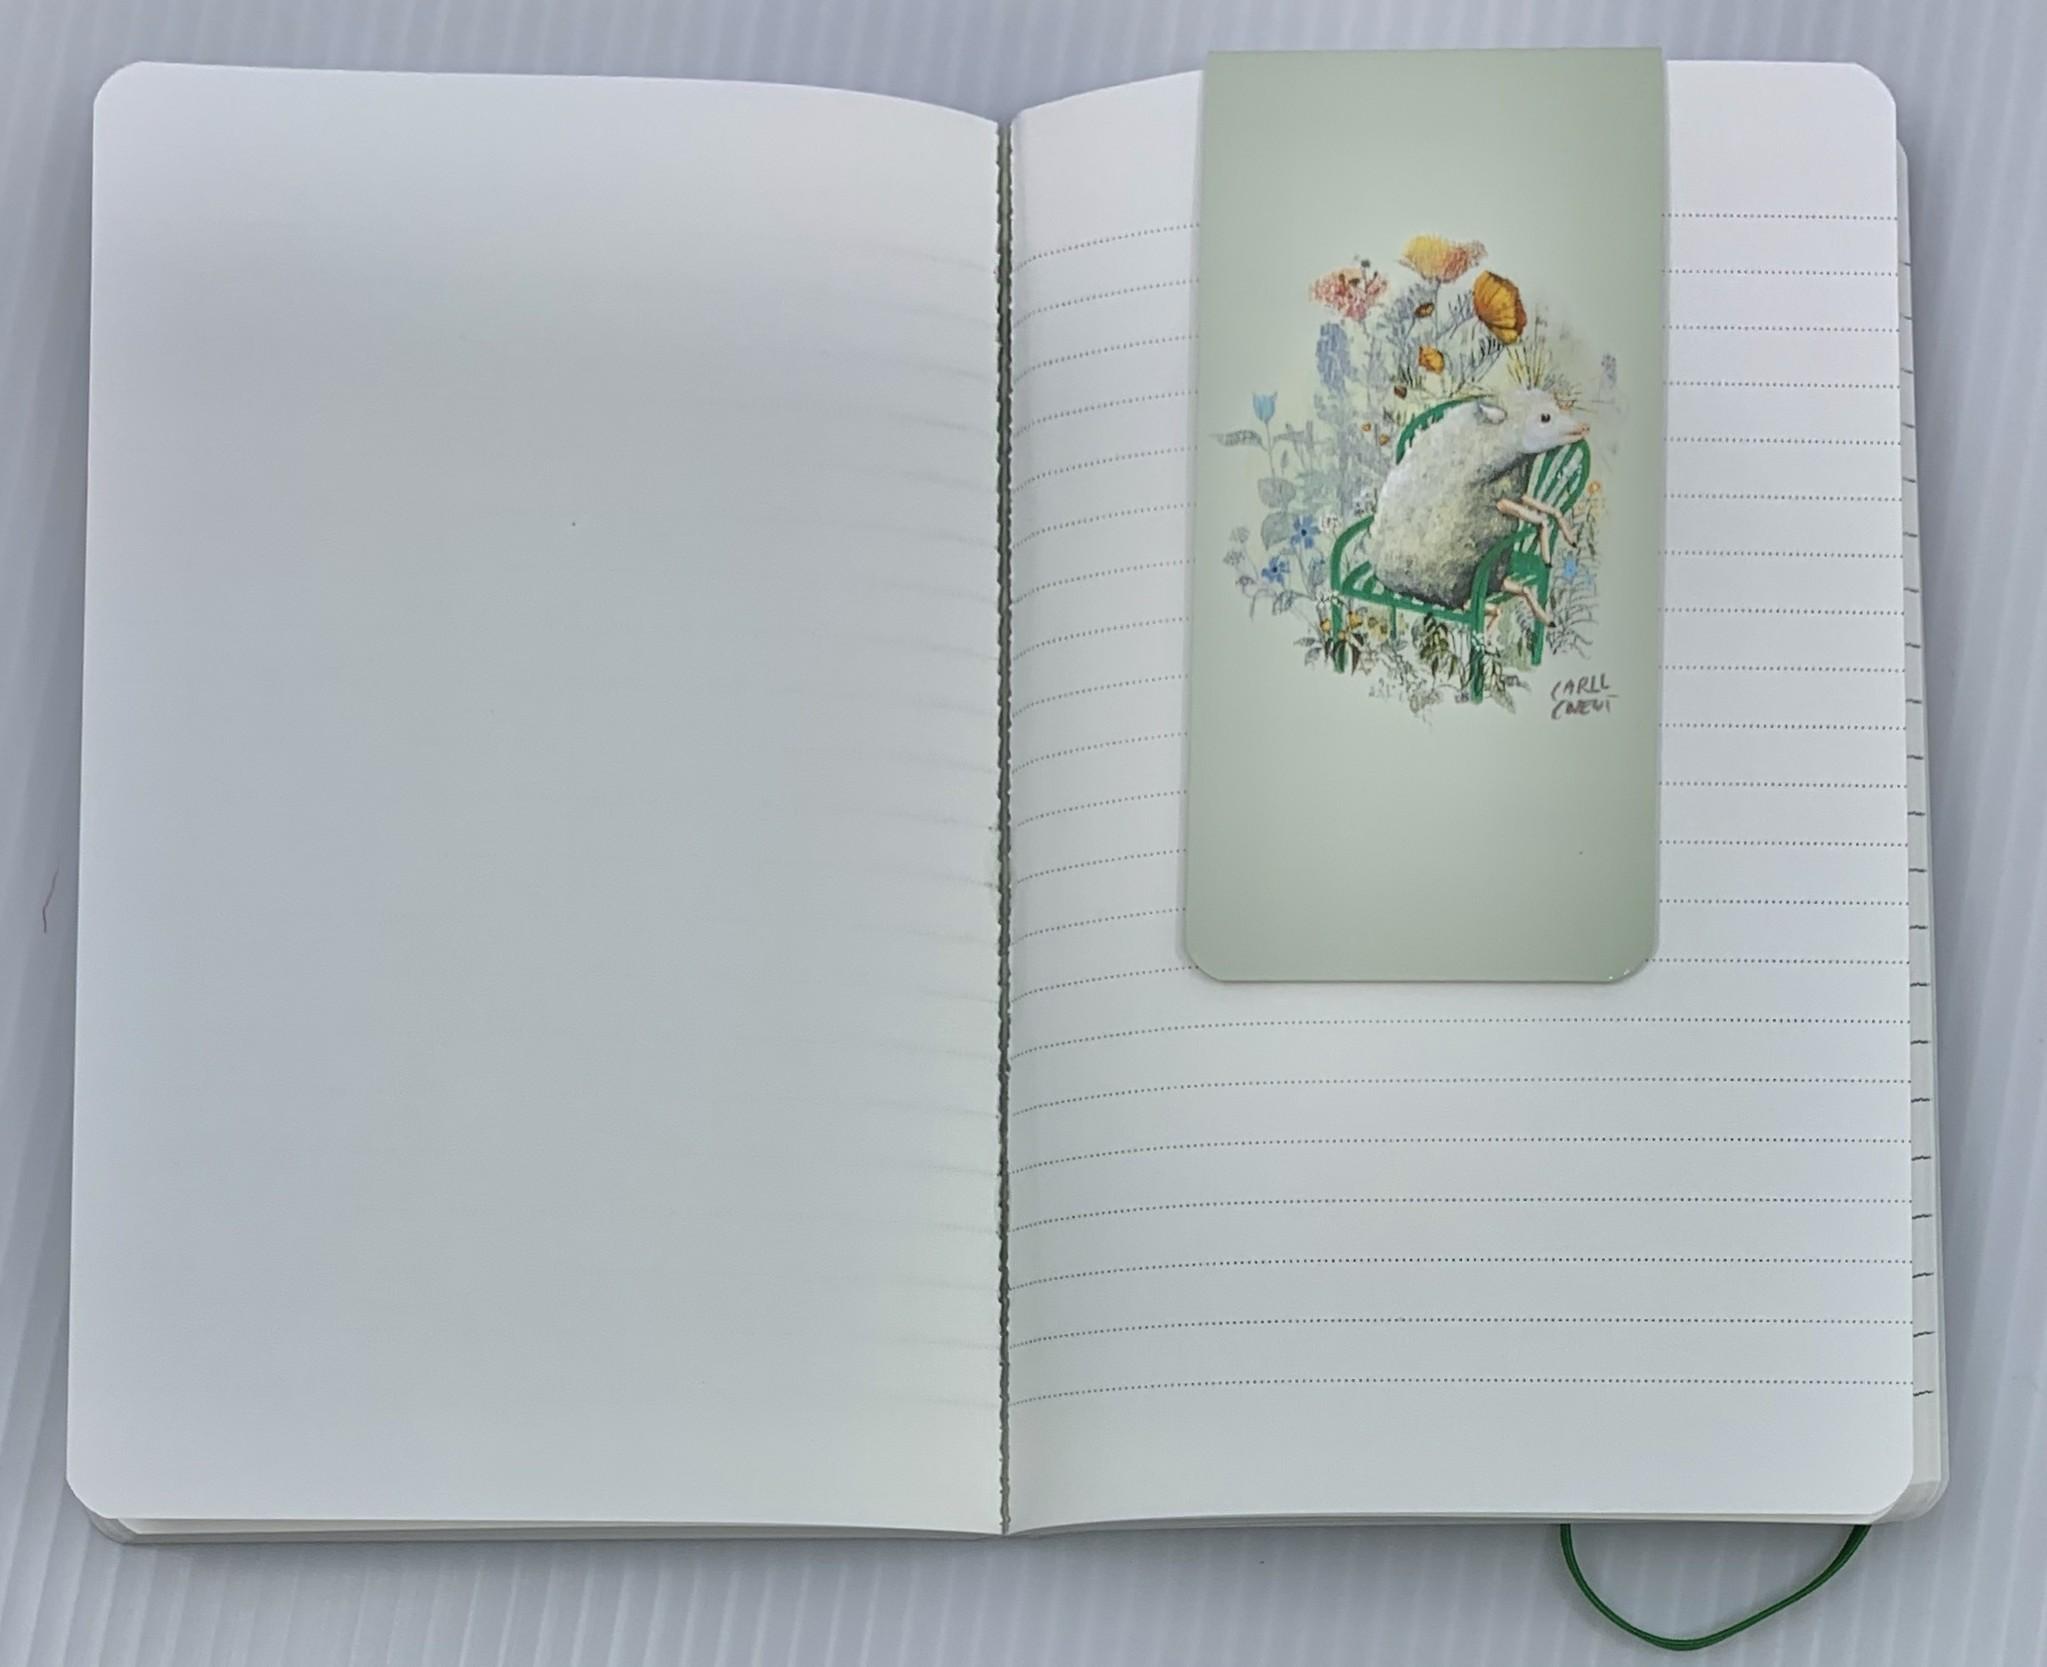 Carll Cneut Magnetic bookmark - Carll Cneut